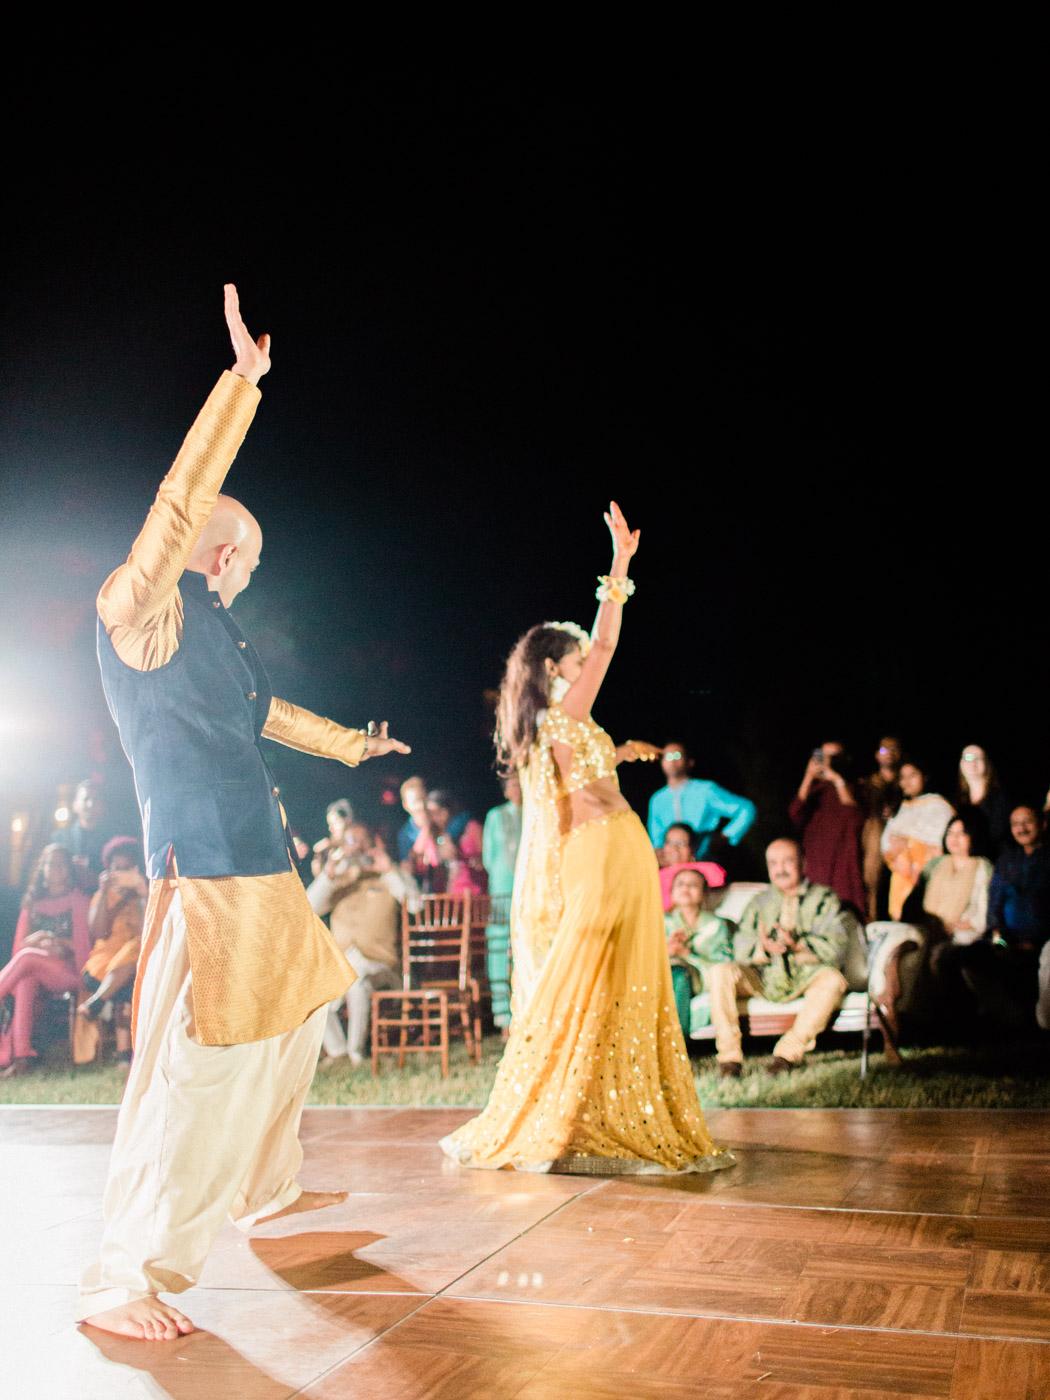 Toronto-Collingwood-wedding-photographer-indian-wedding-documentary37.jpg